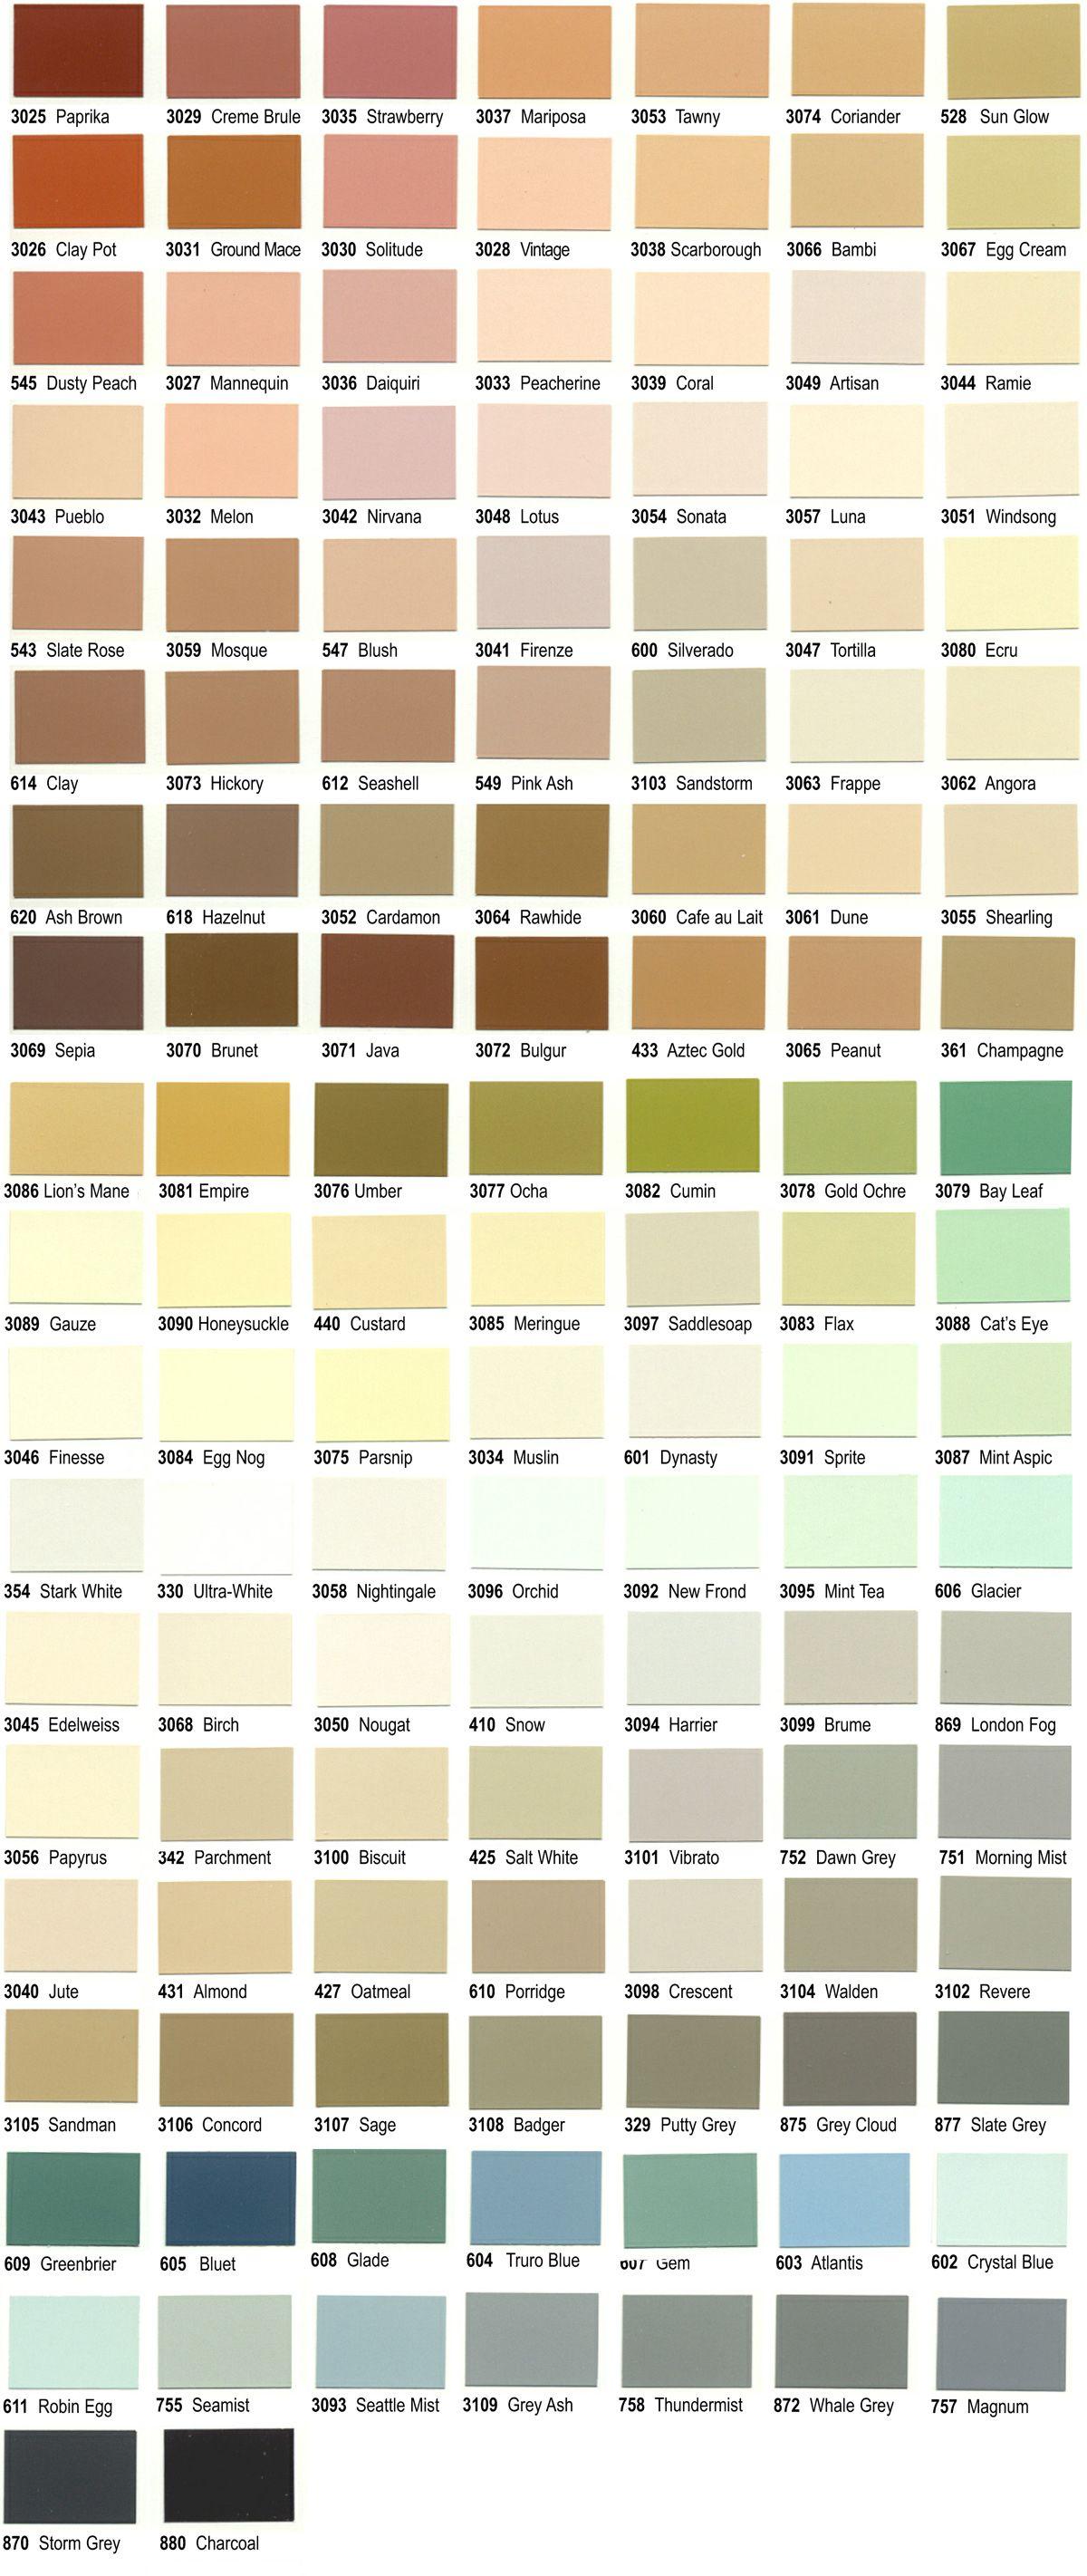 Peerless Toilet Color Chart Gerber Toilet Color Chart Retro